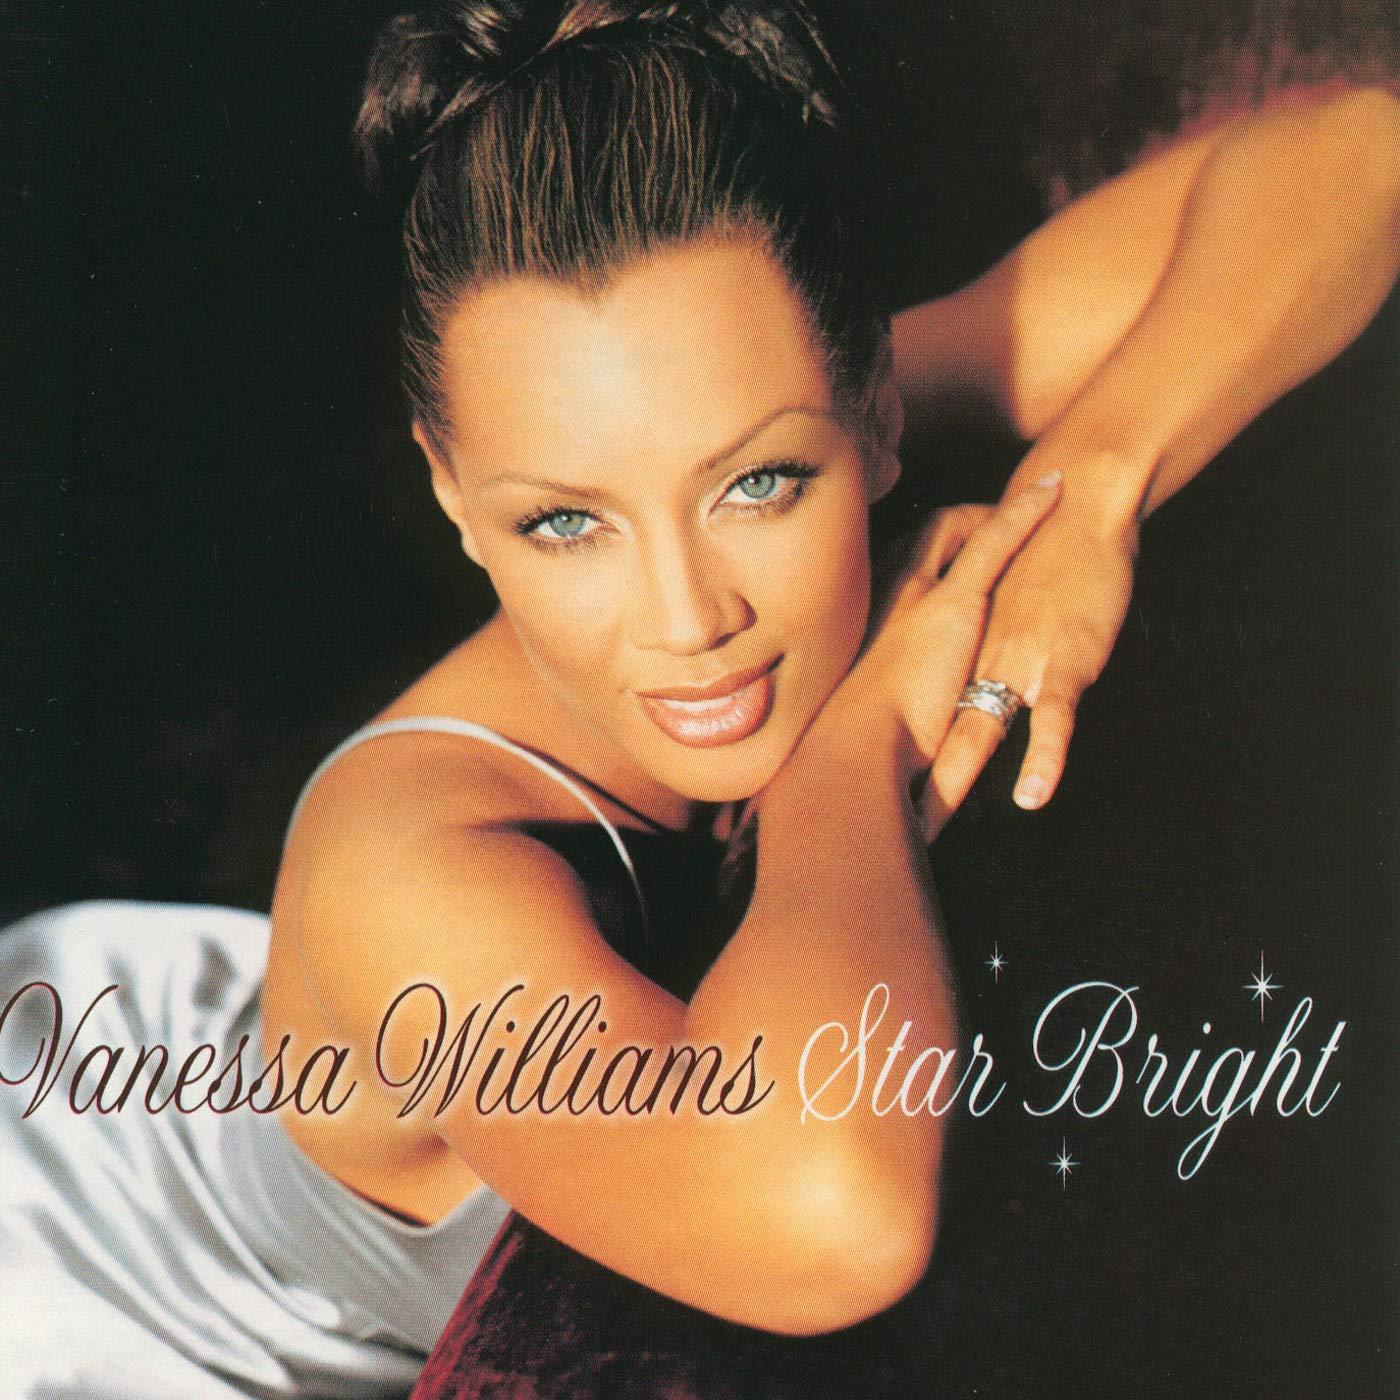 Vanessa Williams – Star Bright (1996) [FLAC]